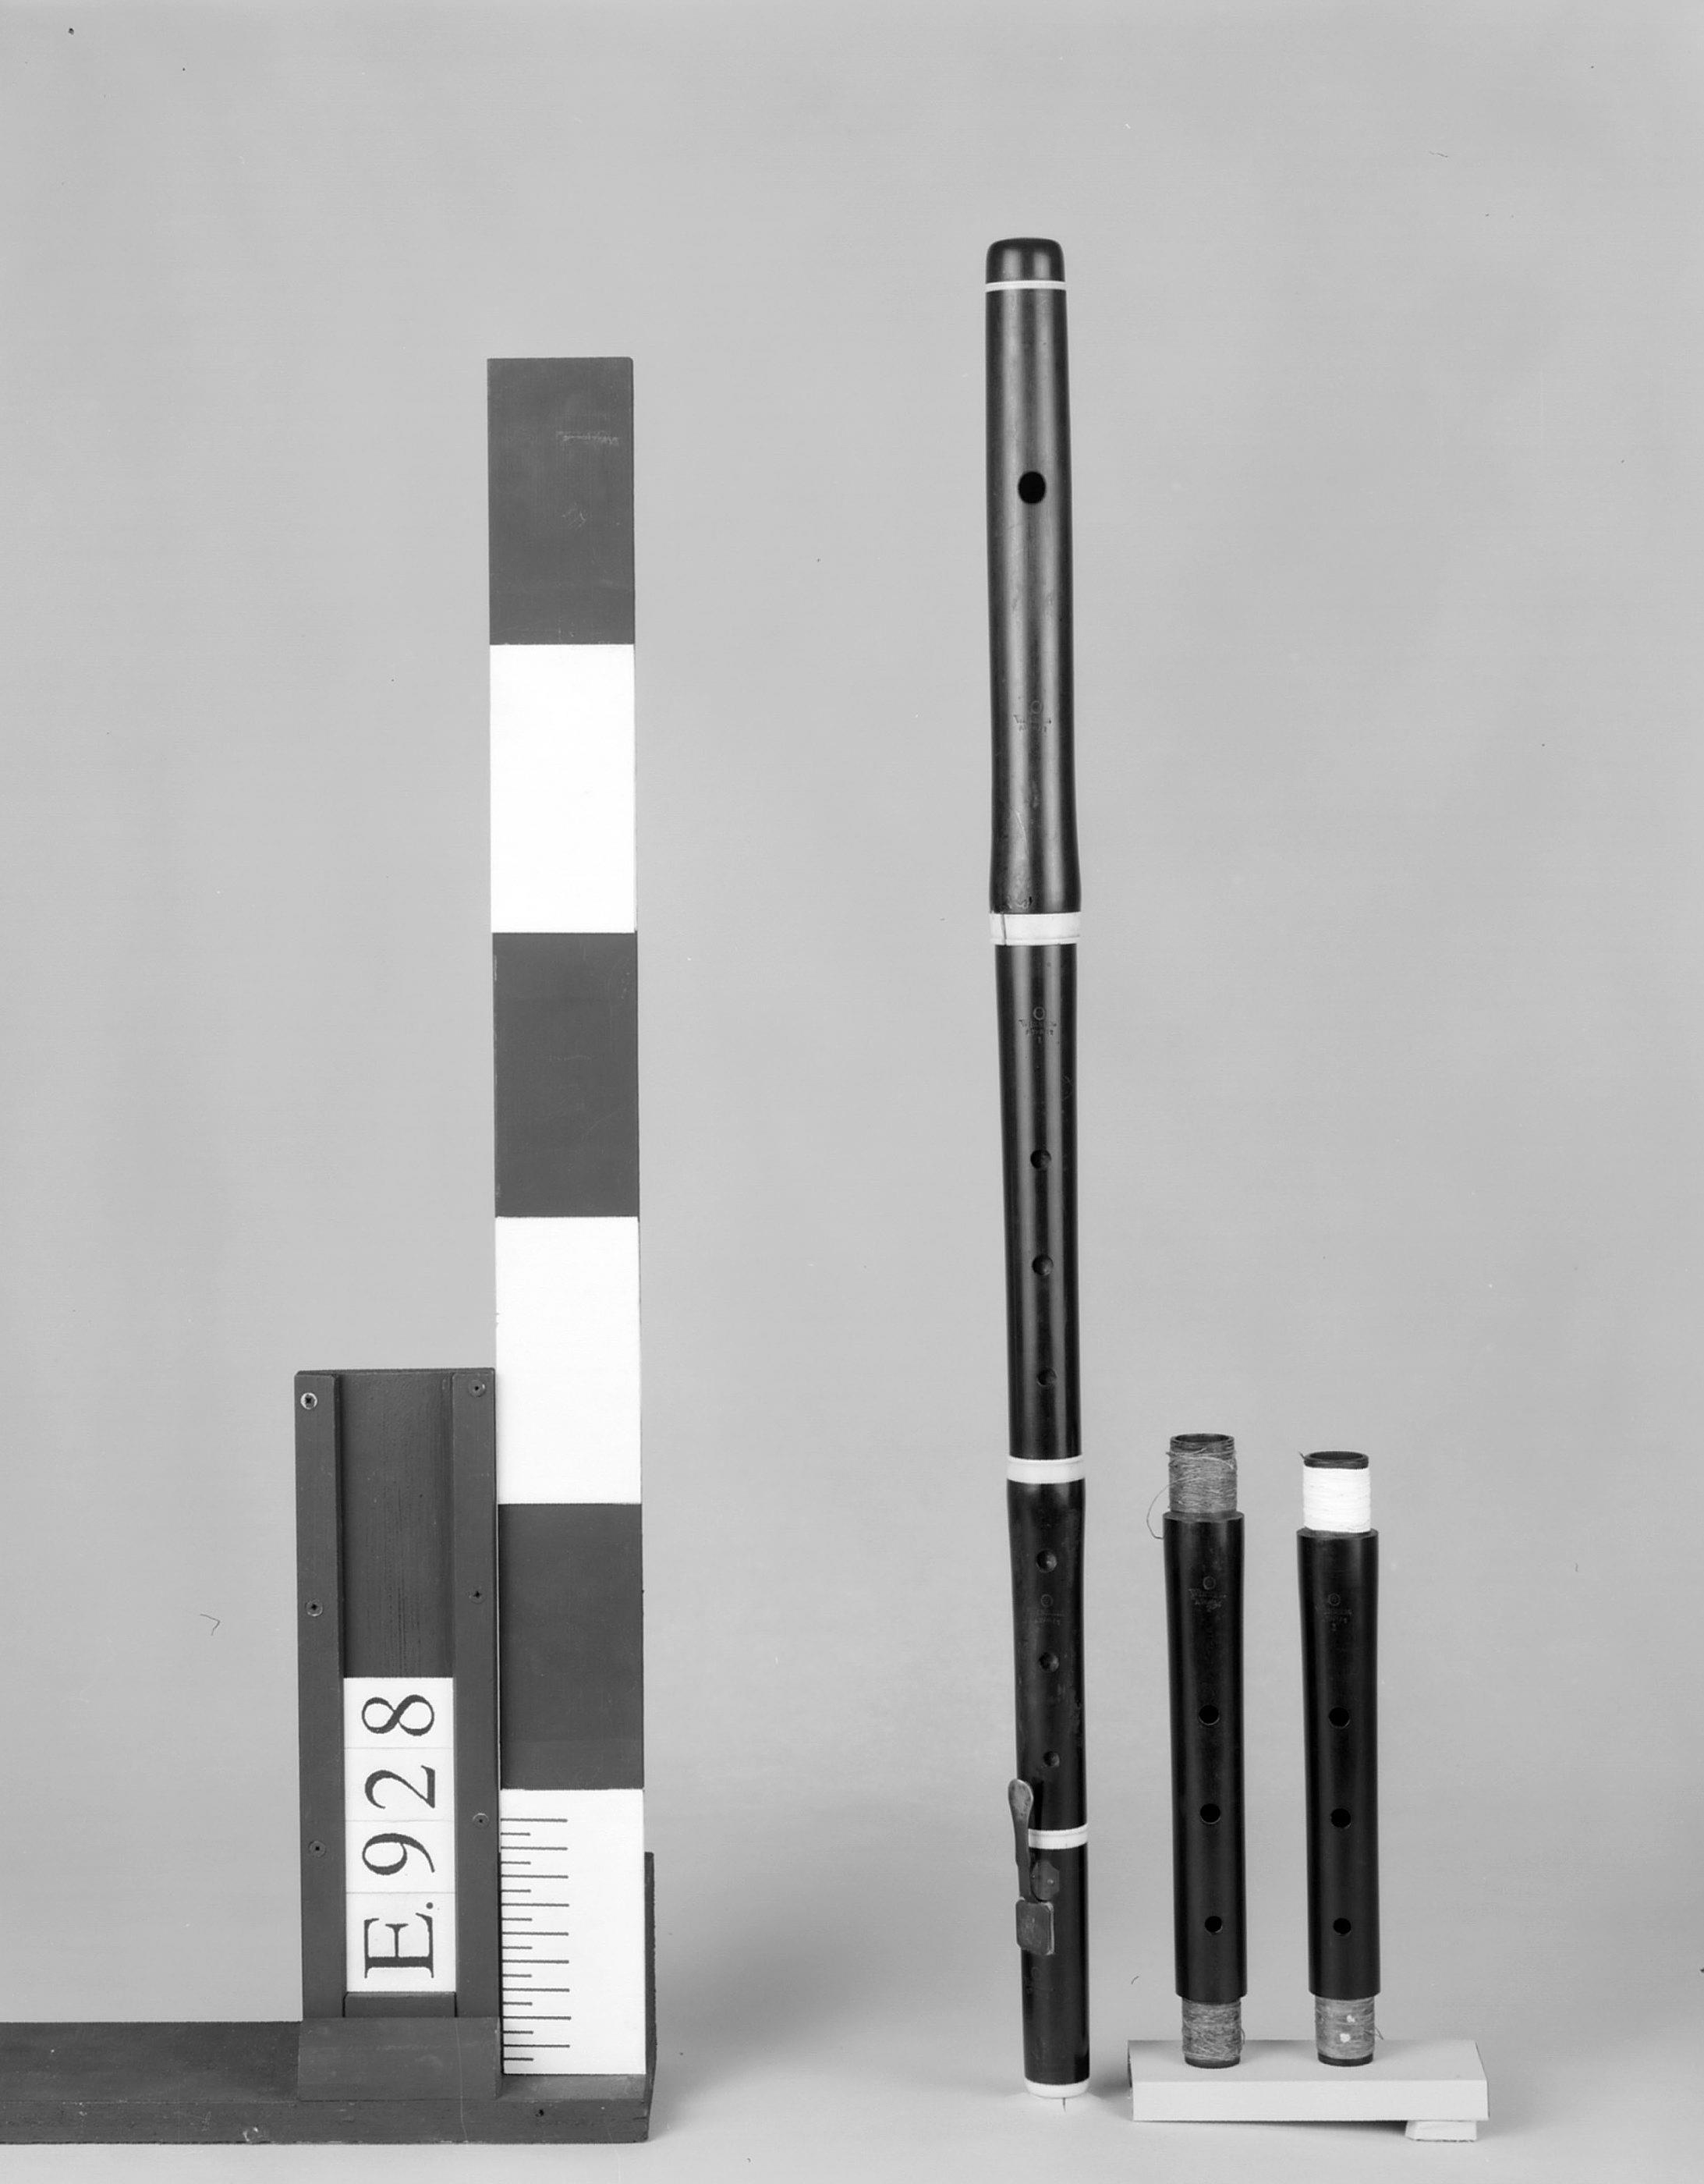 Flûte traversière | Nicolas Winnen